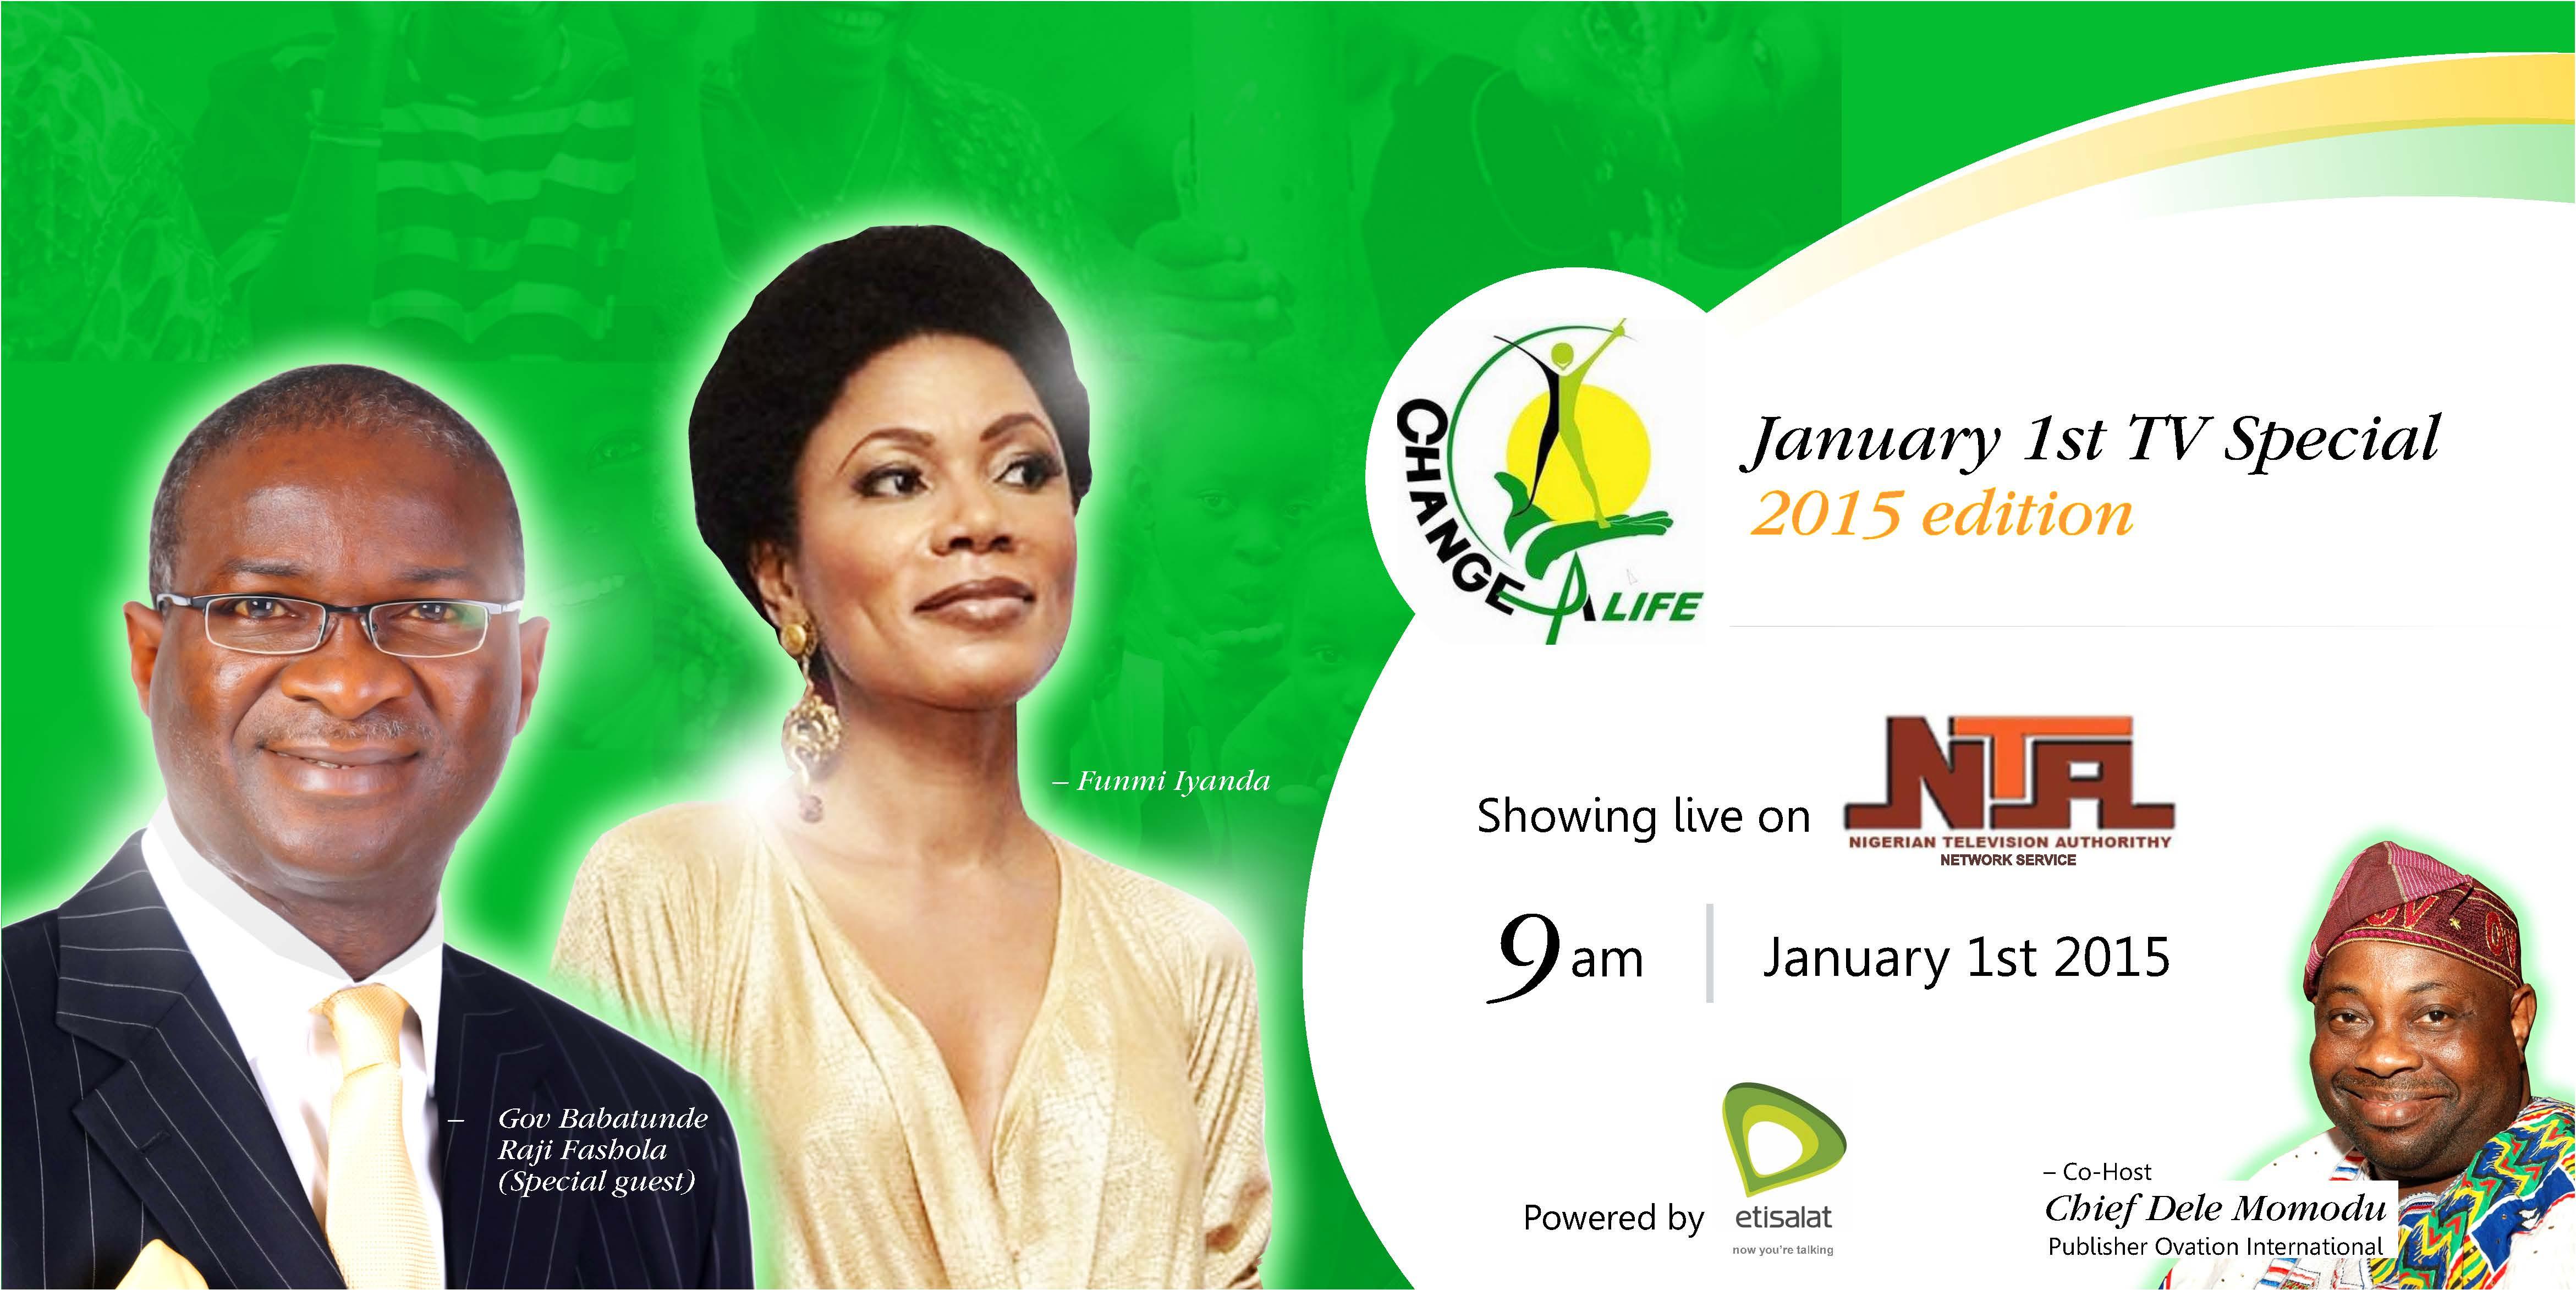 Change A Life Nigeria TV show 2015